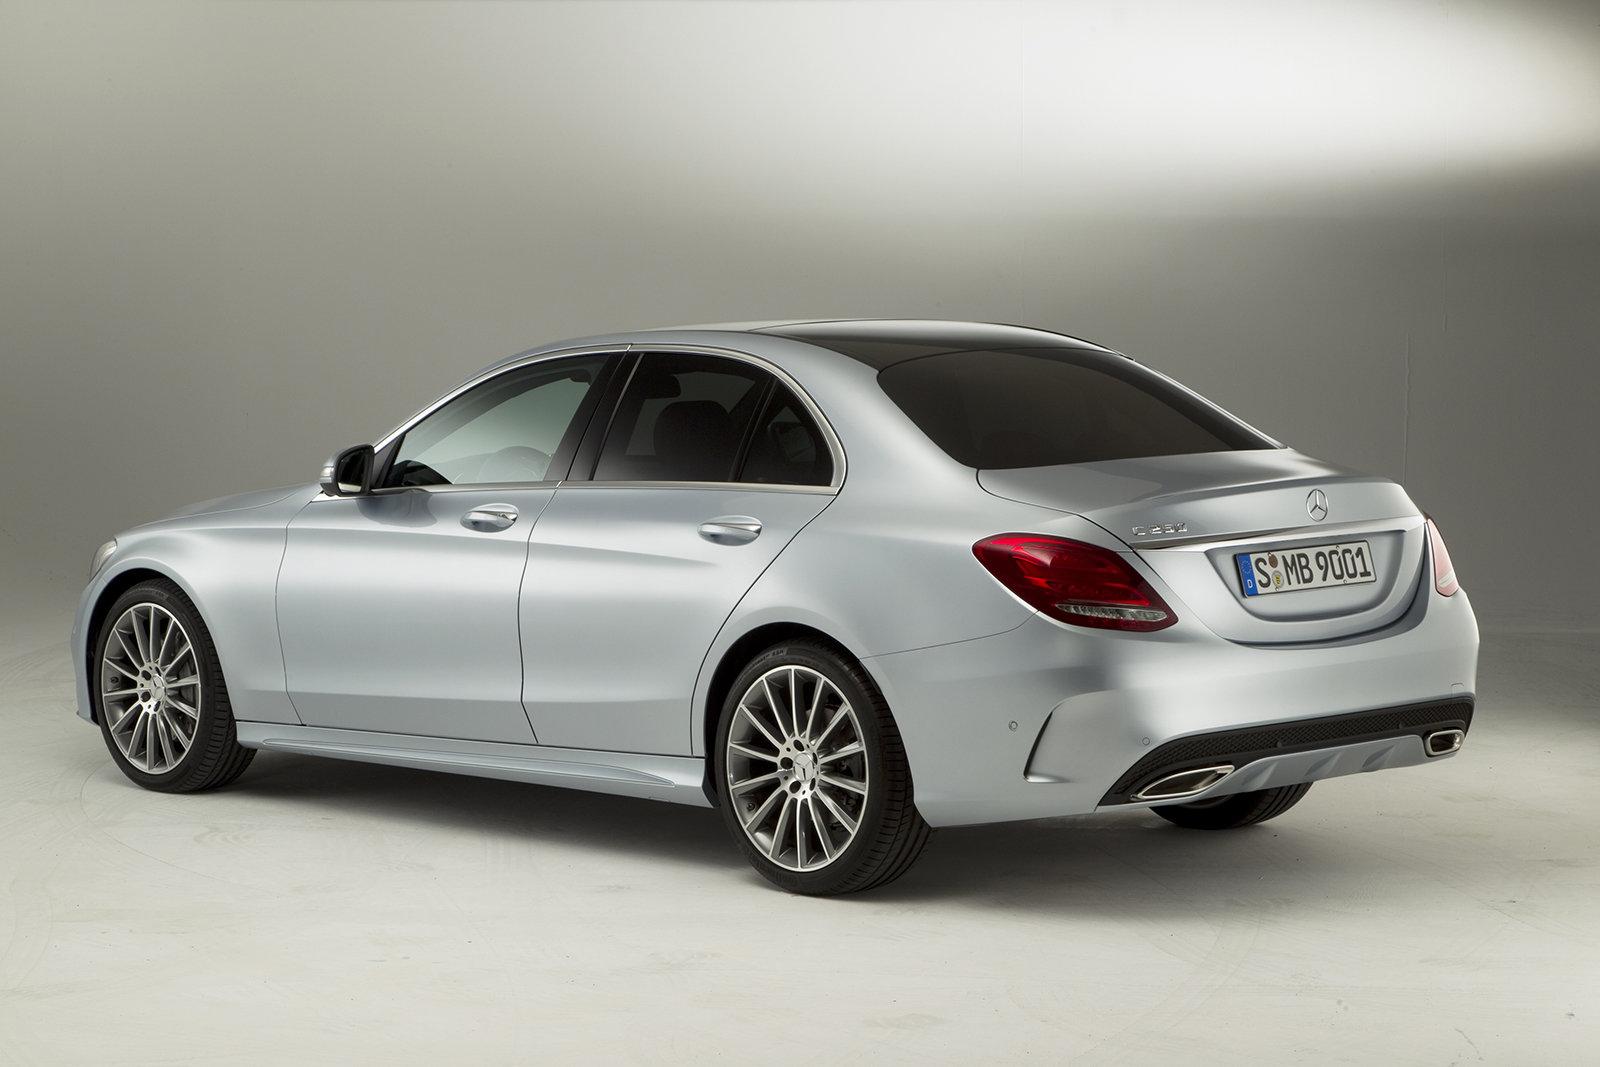 Mercedes-Benz C-класса четвертого поколения